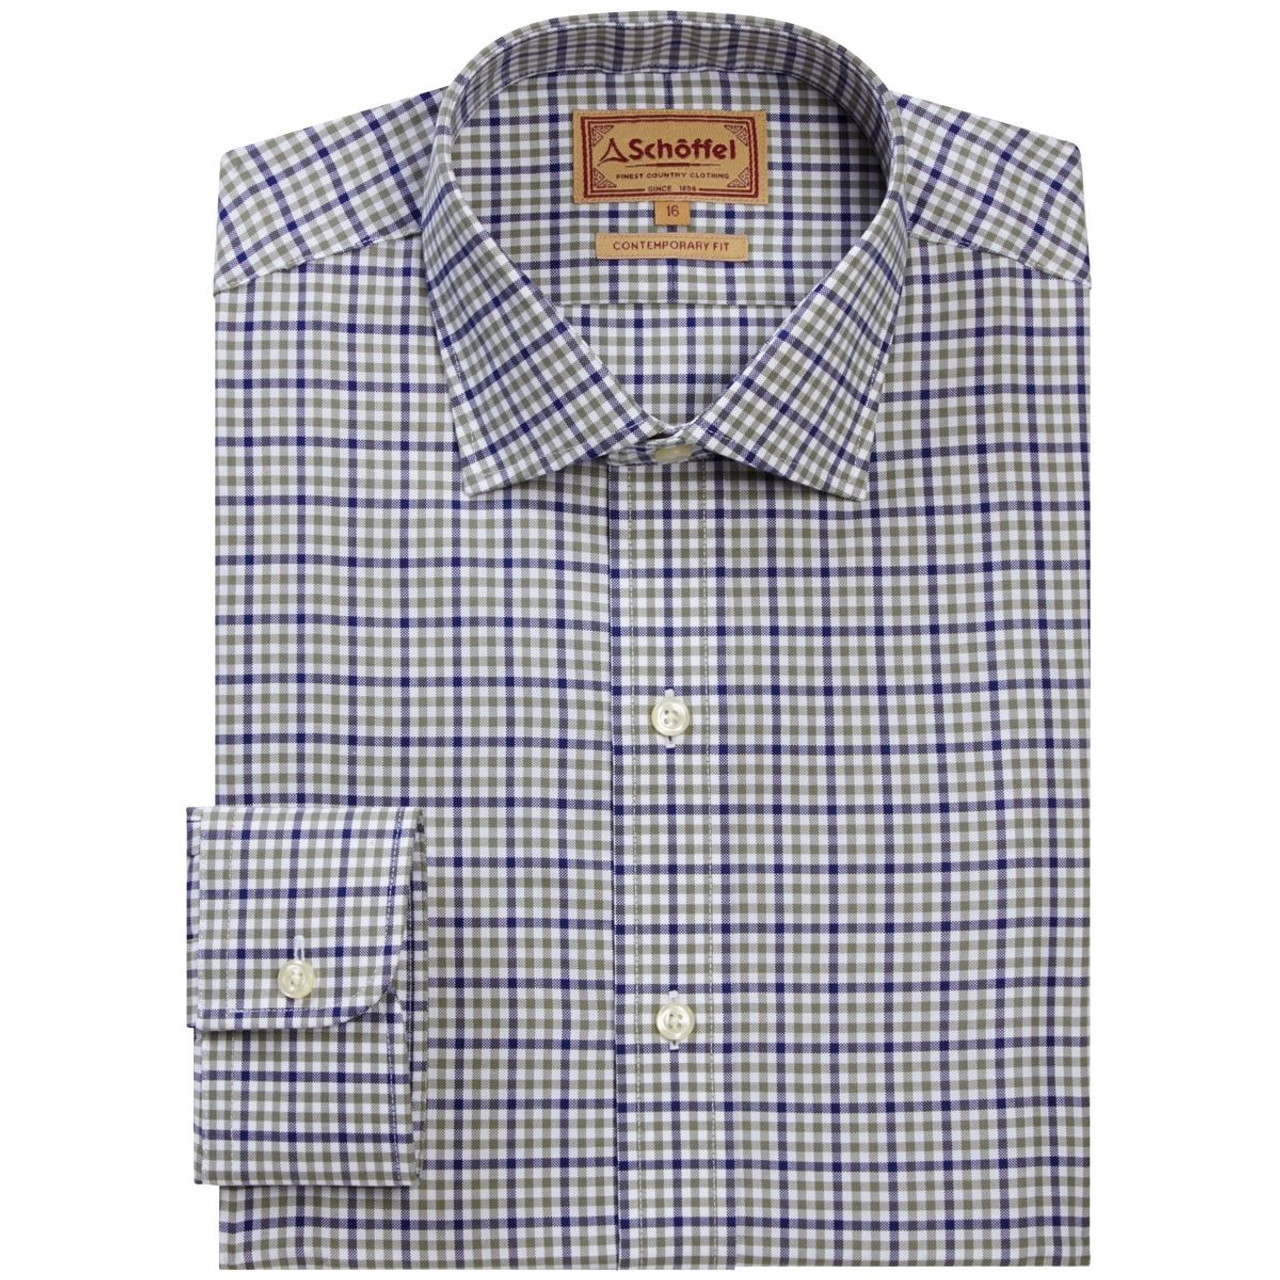 Navy/Olive Micro Schoffel Mens Burnsall Shirt